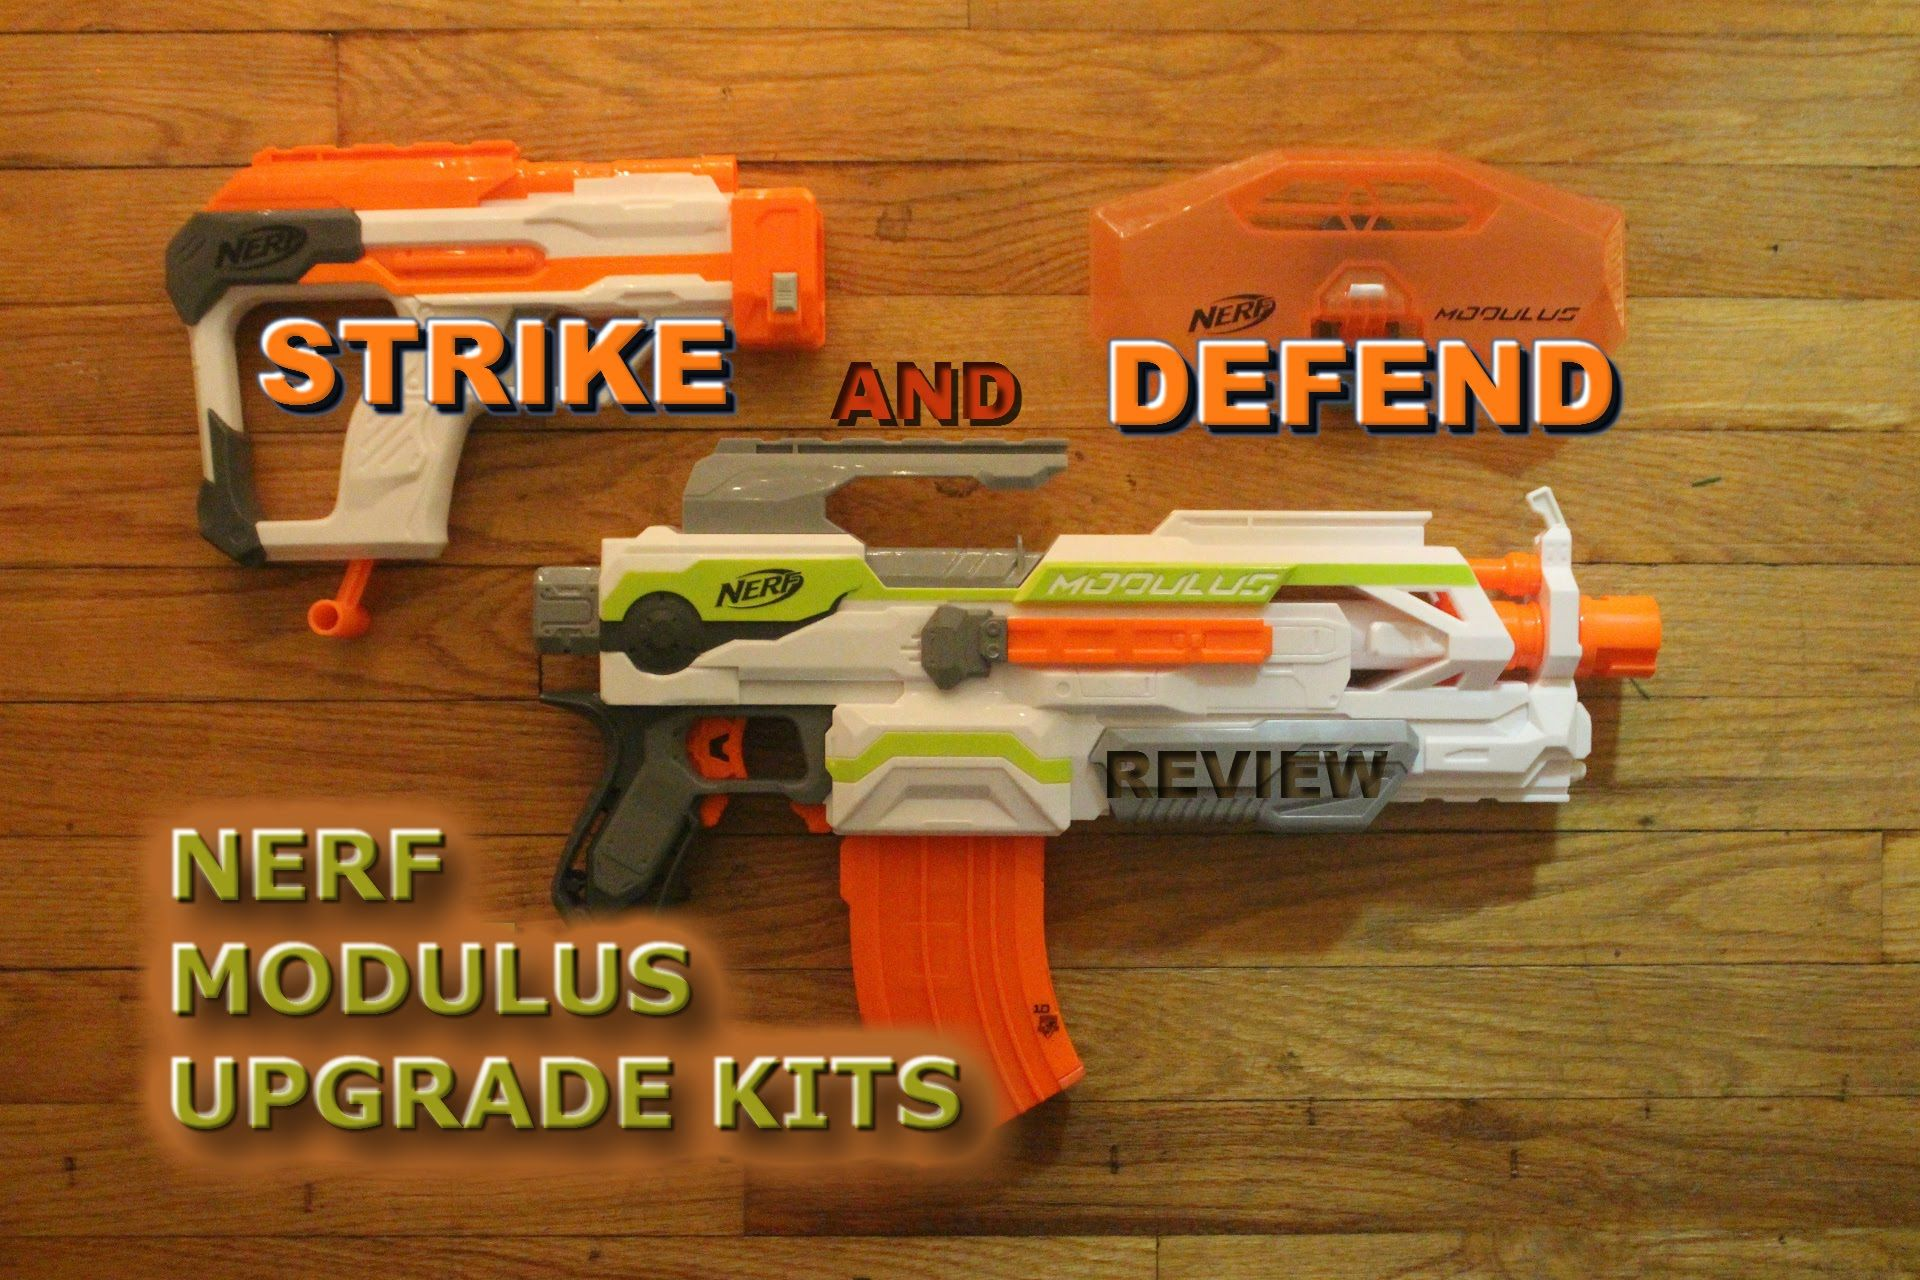 Nerf pistol turned into a SHIELD agents pistol.